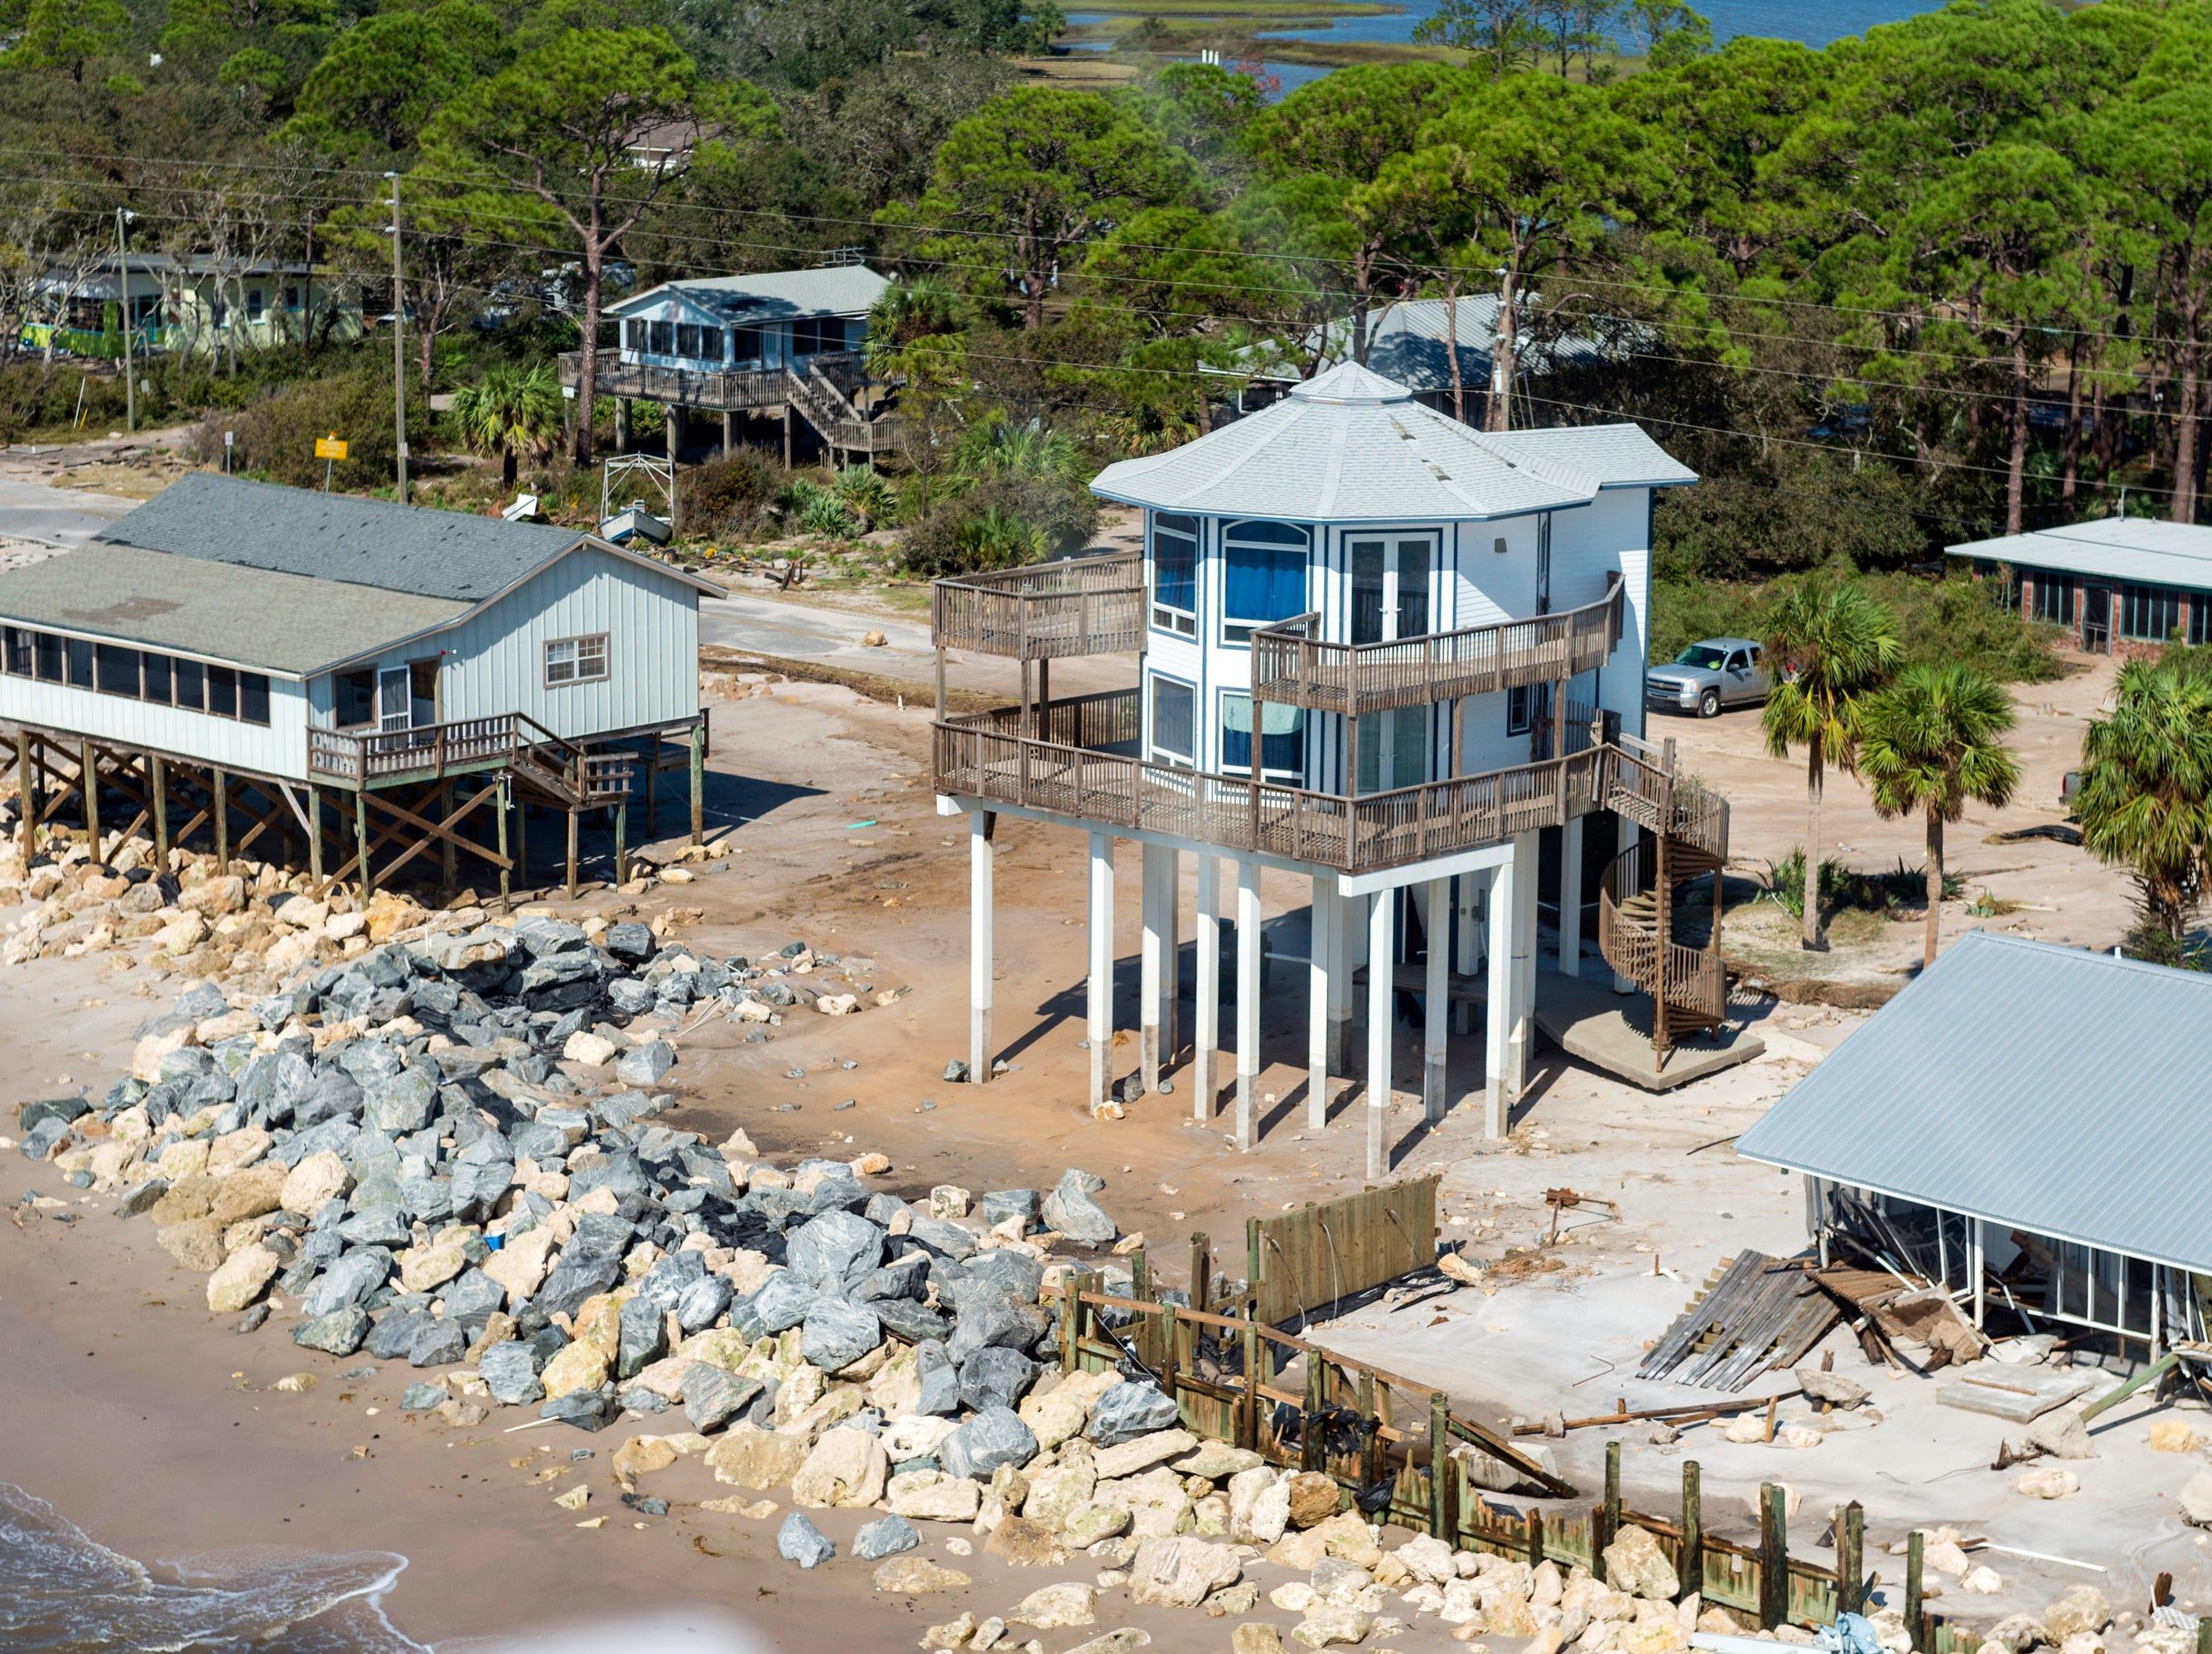 Aerial photos of the aftermath of Hurricane Michael on St Teresa Beach, Fla., Thursday, Oct. 11, 2018.